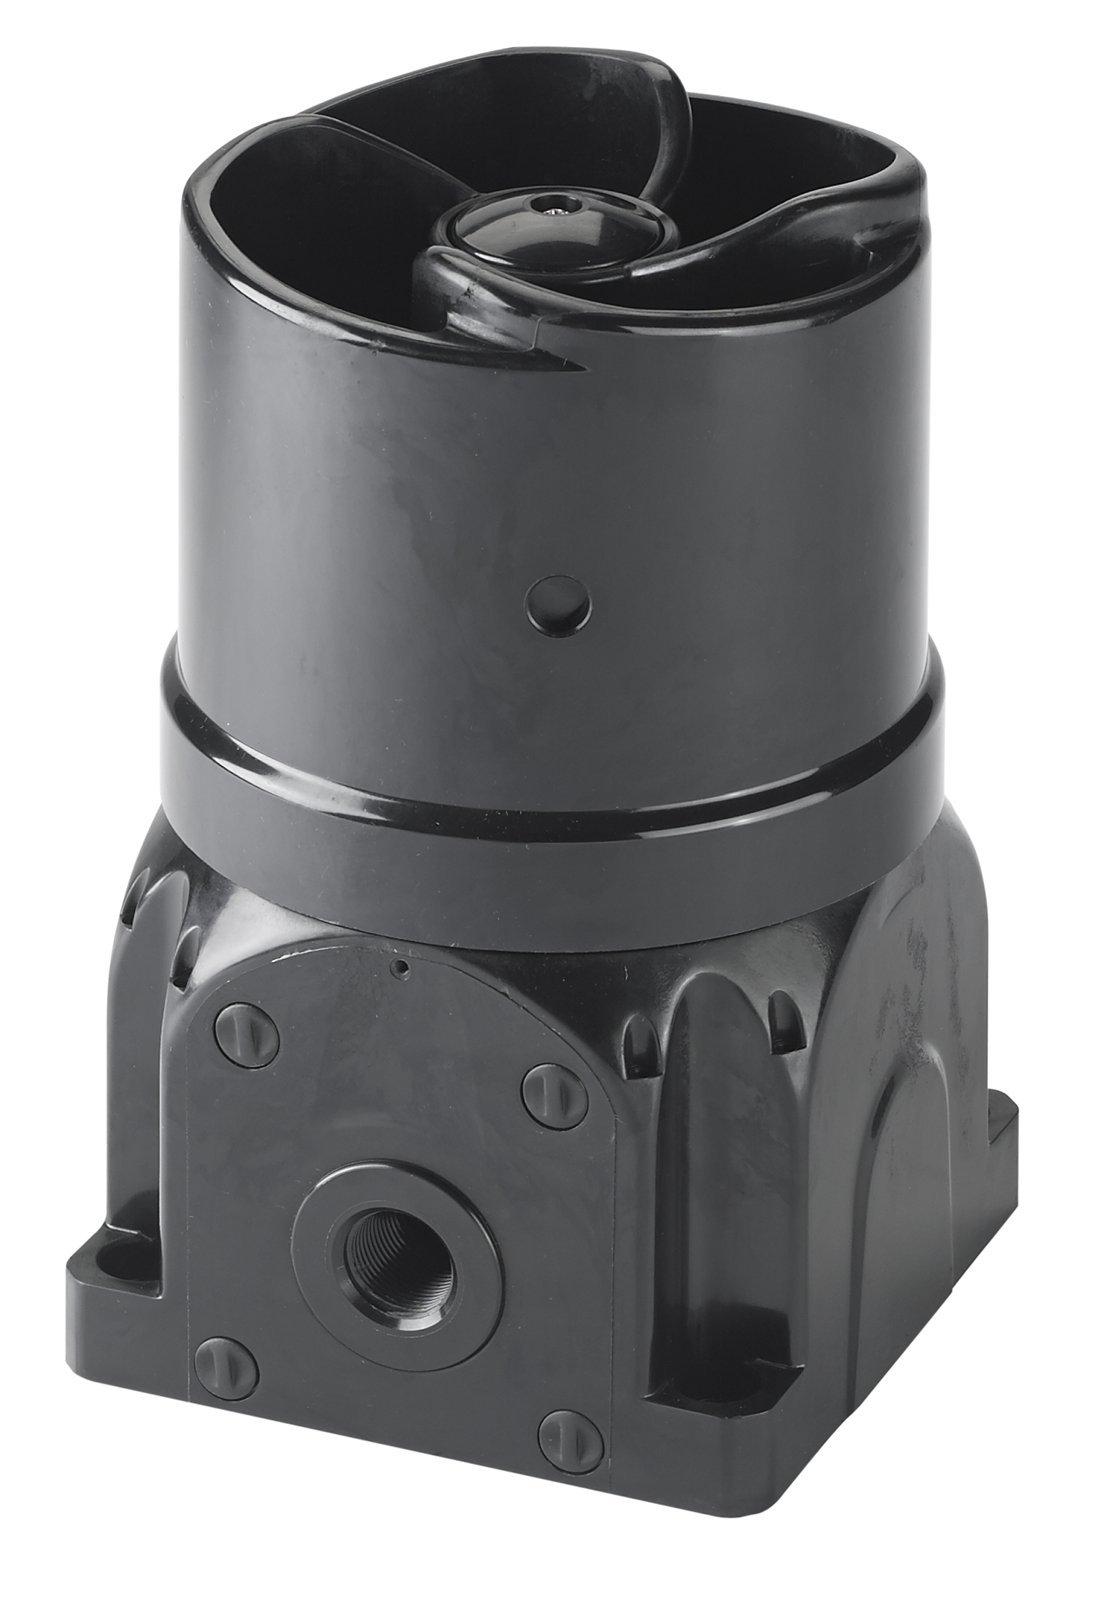 Federal Signal G-SND-MV-D Global Series Sounder, Multi-Tone, Multi-Voltage, Surface Mount, Black